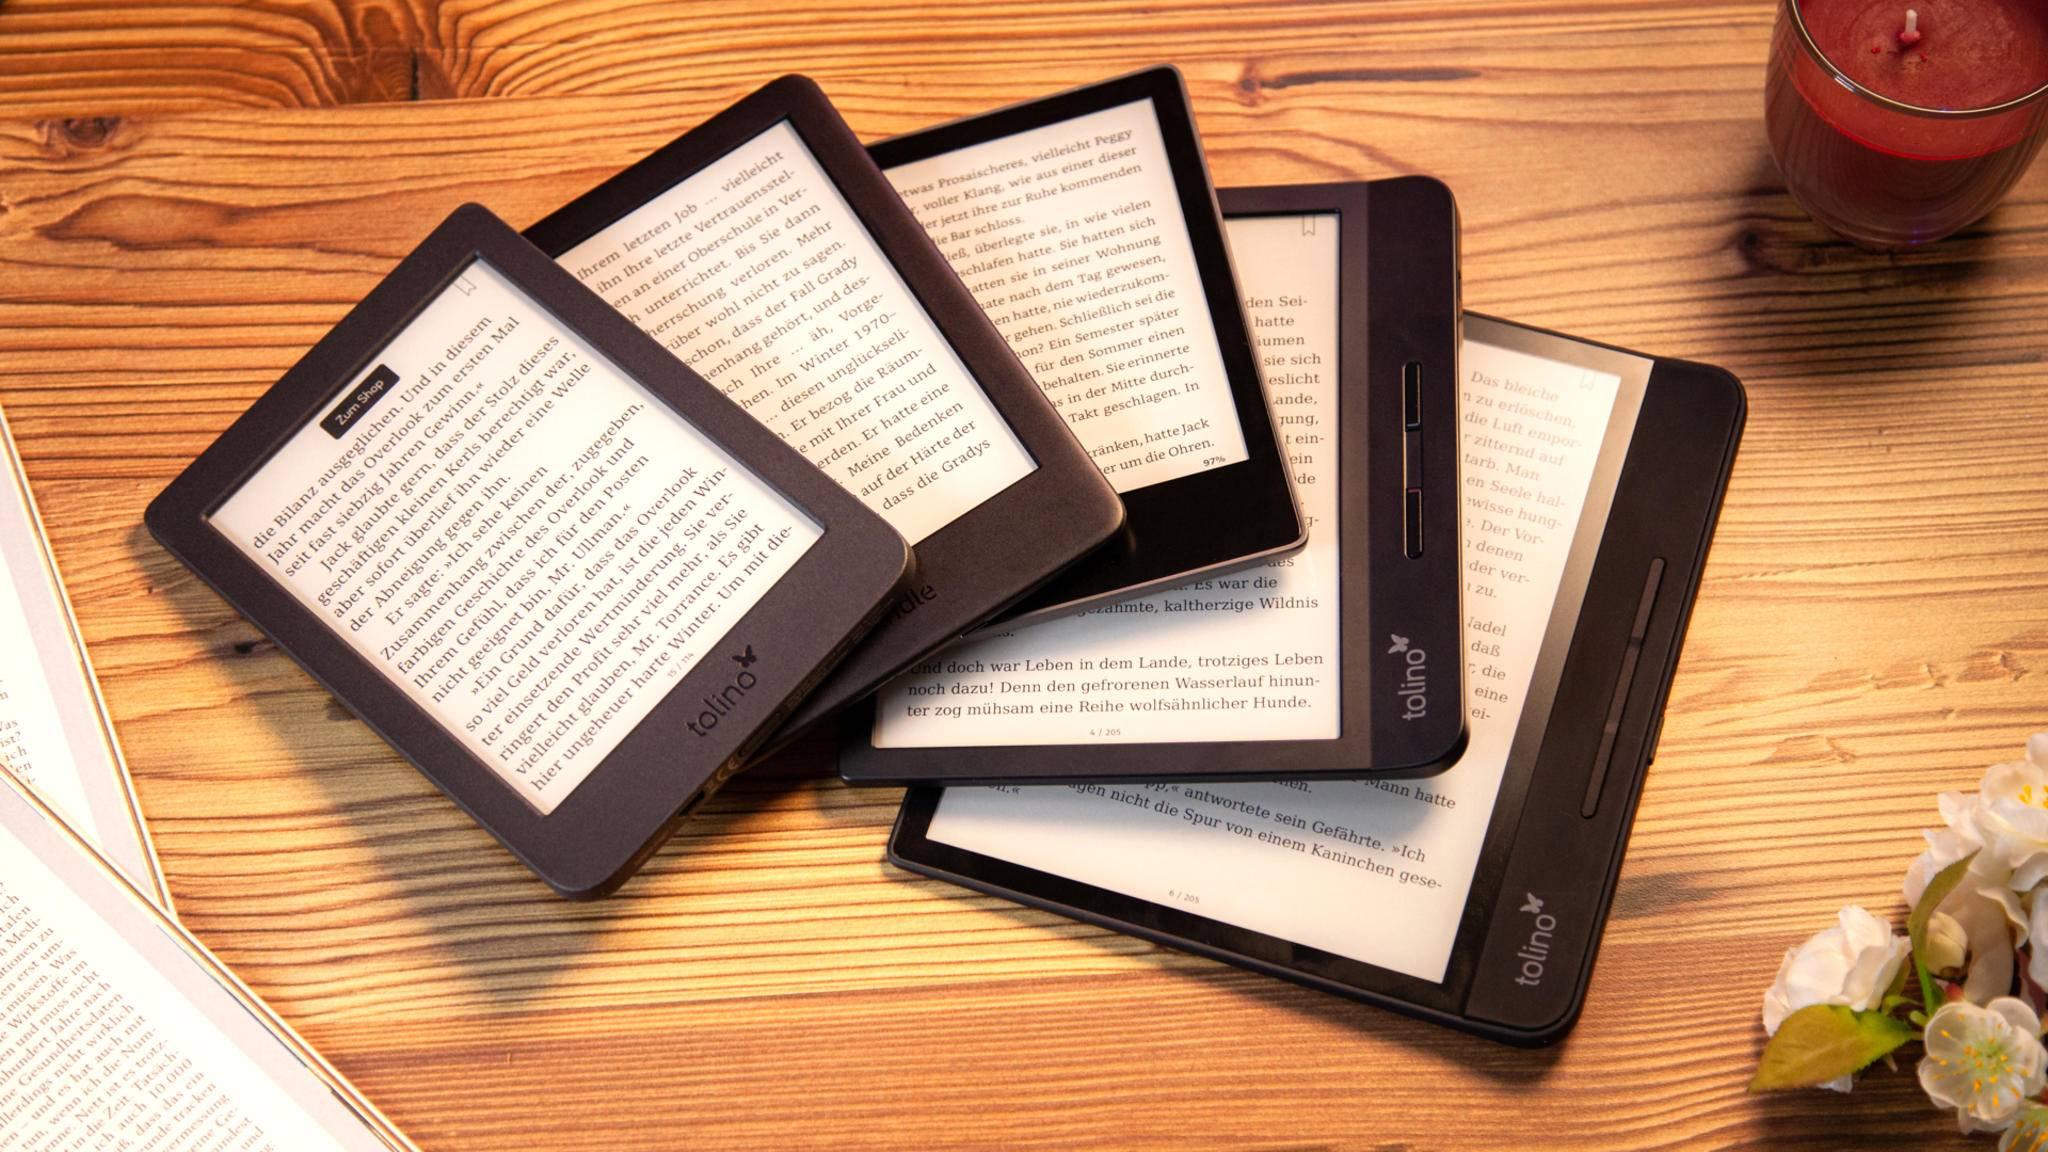 E-Book-Reader Vergleichstest